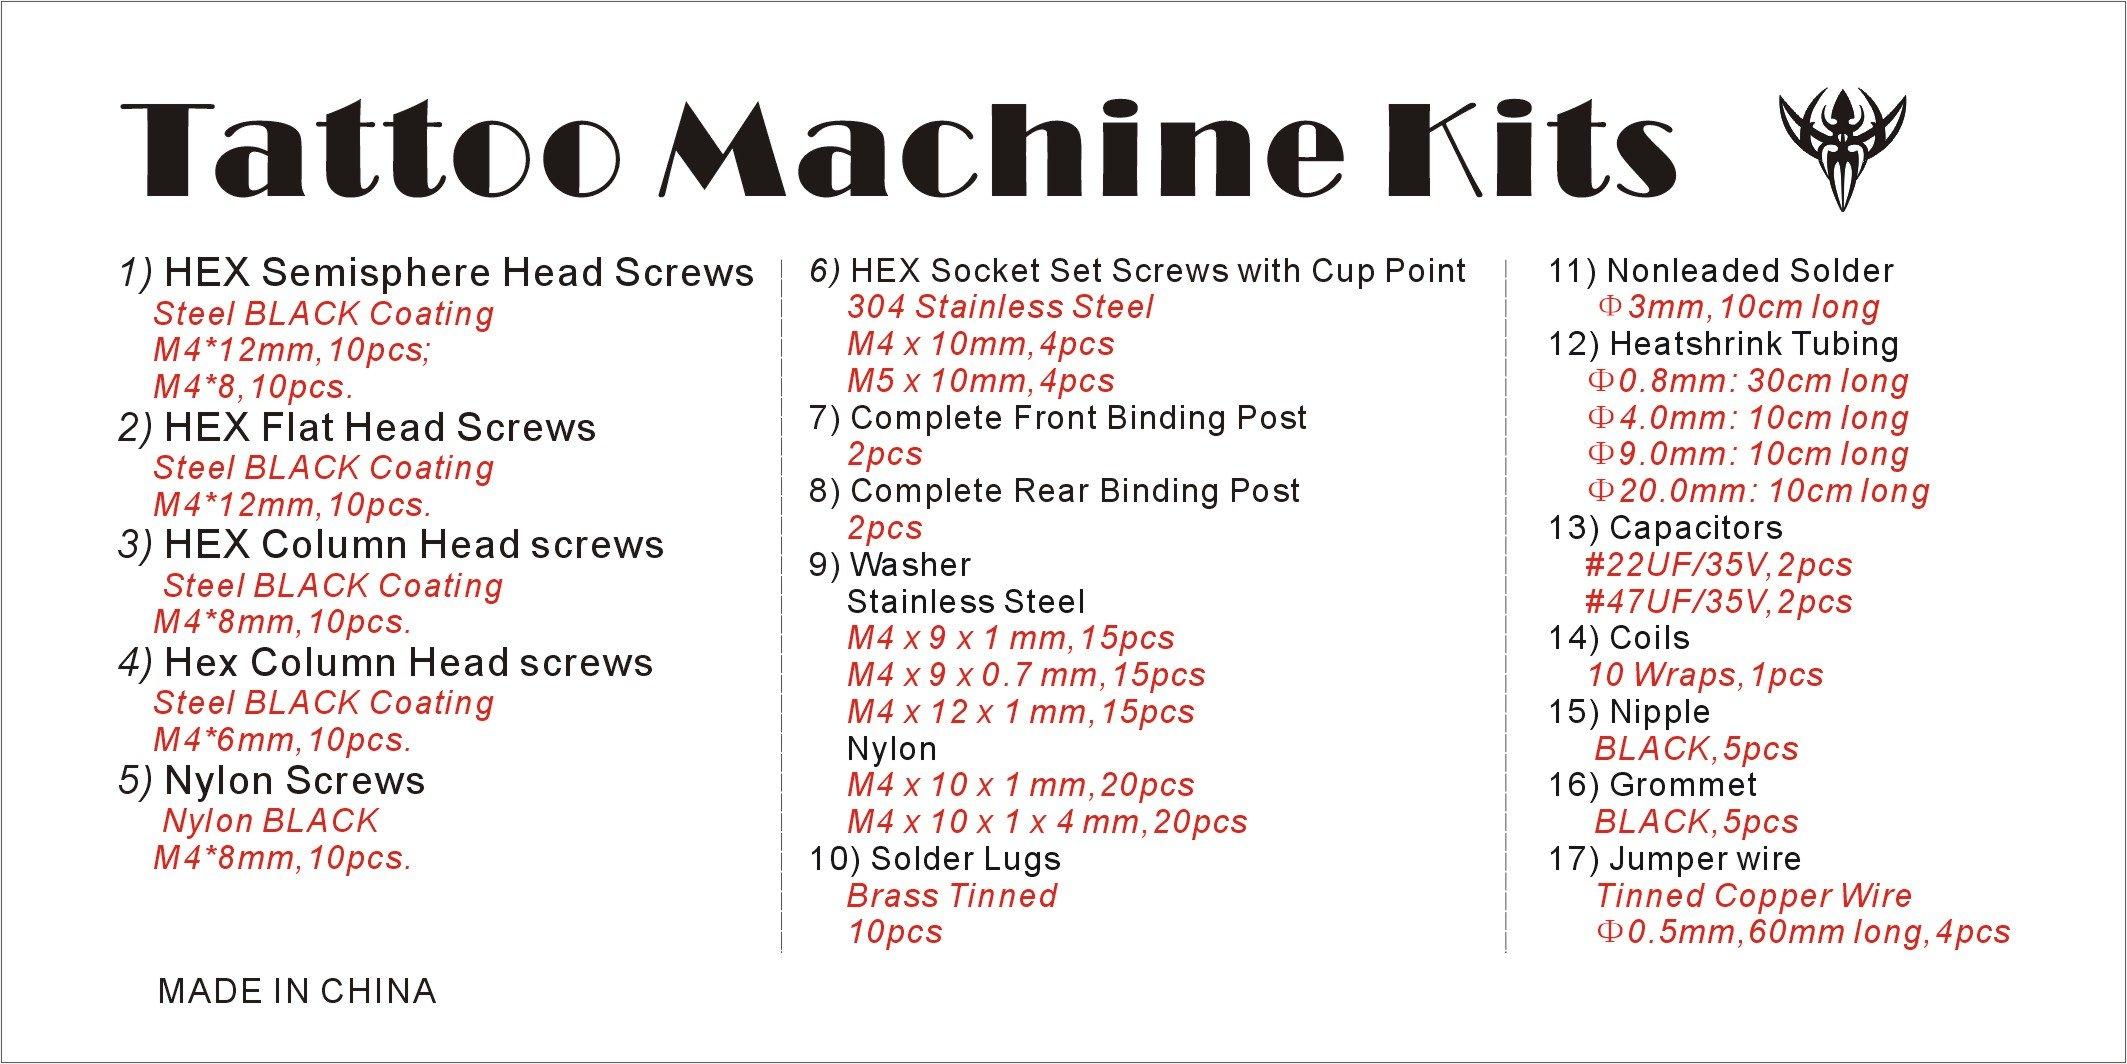 Tattoo Machine Rebuild & Repair Kit - 190+ Parts by Precision